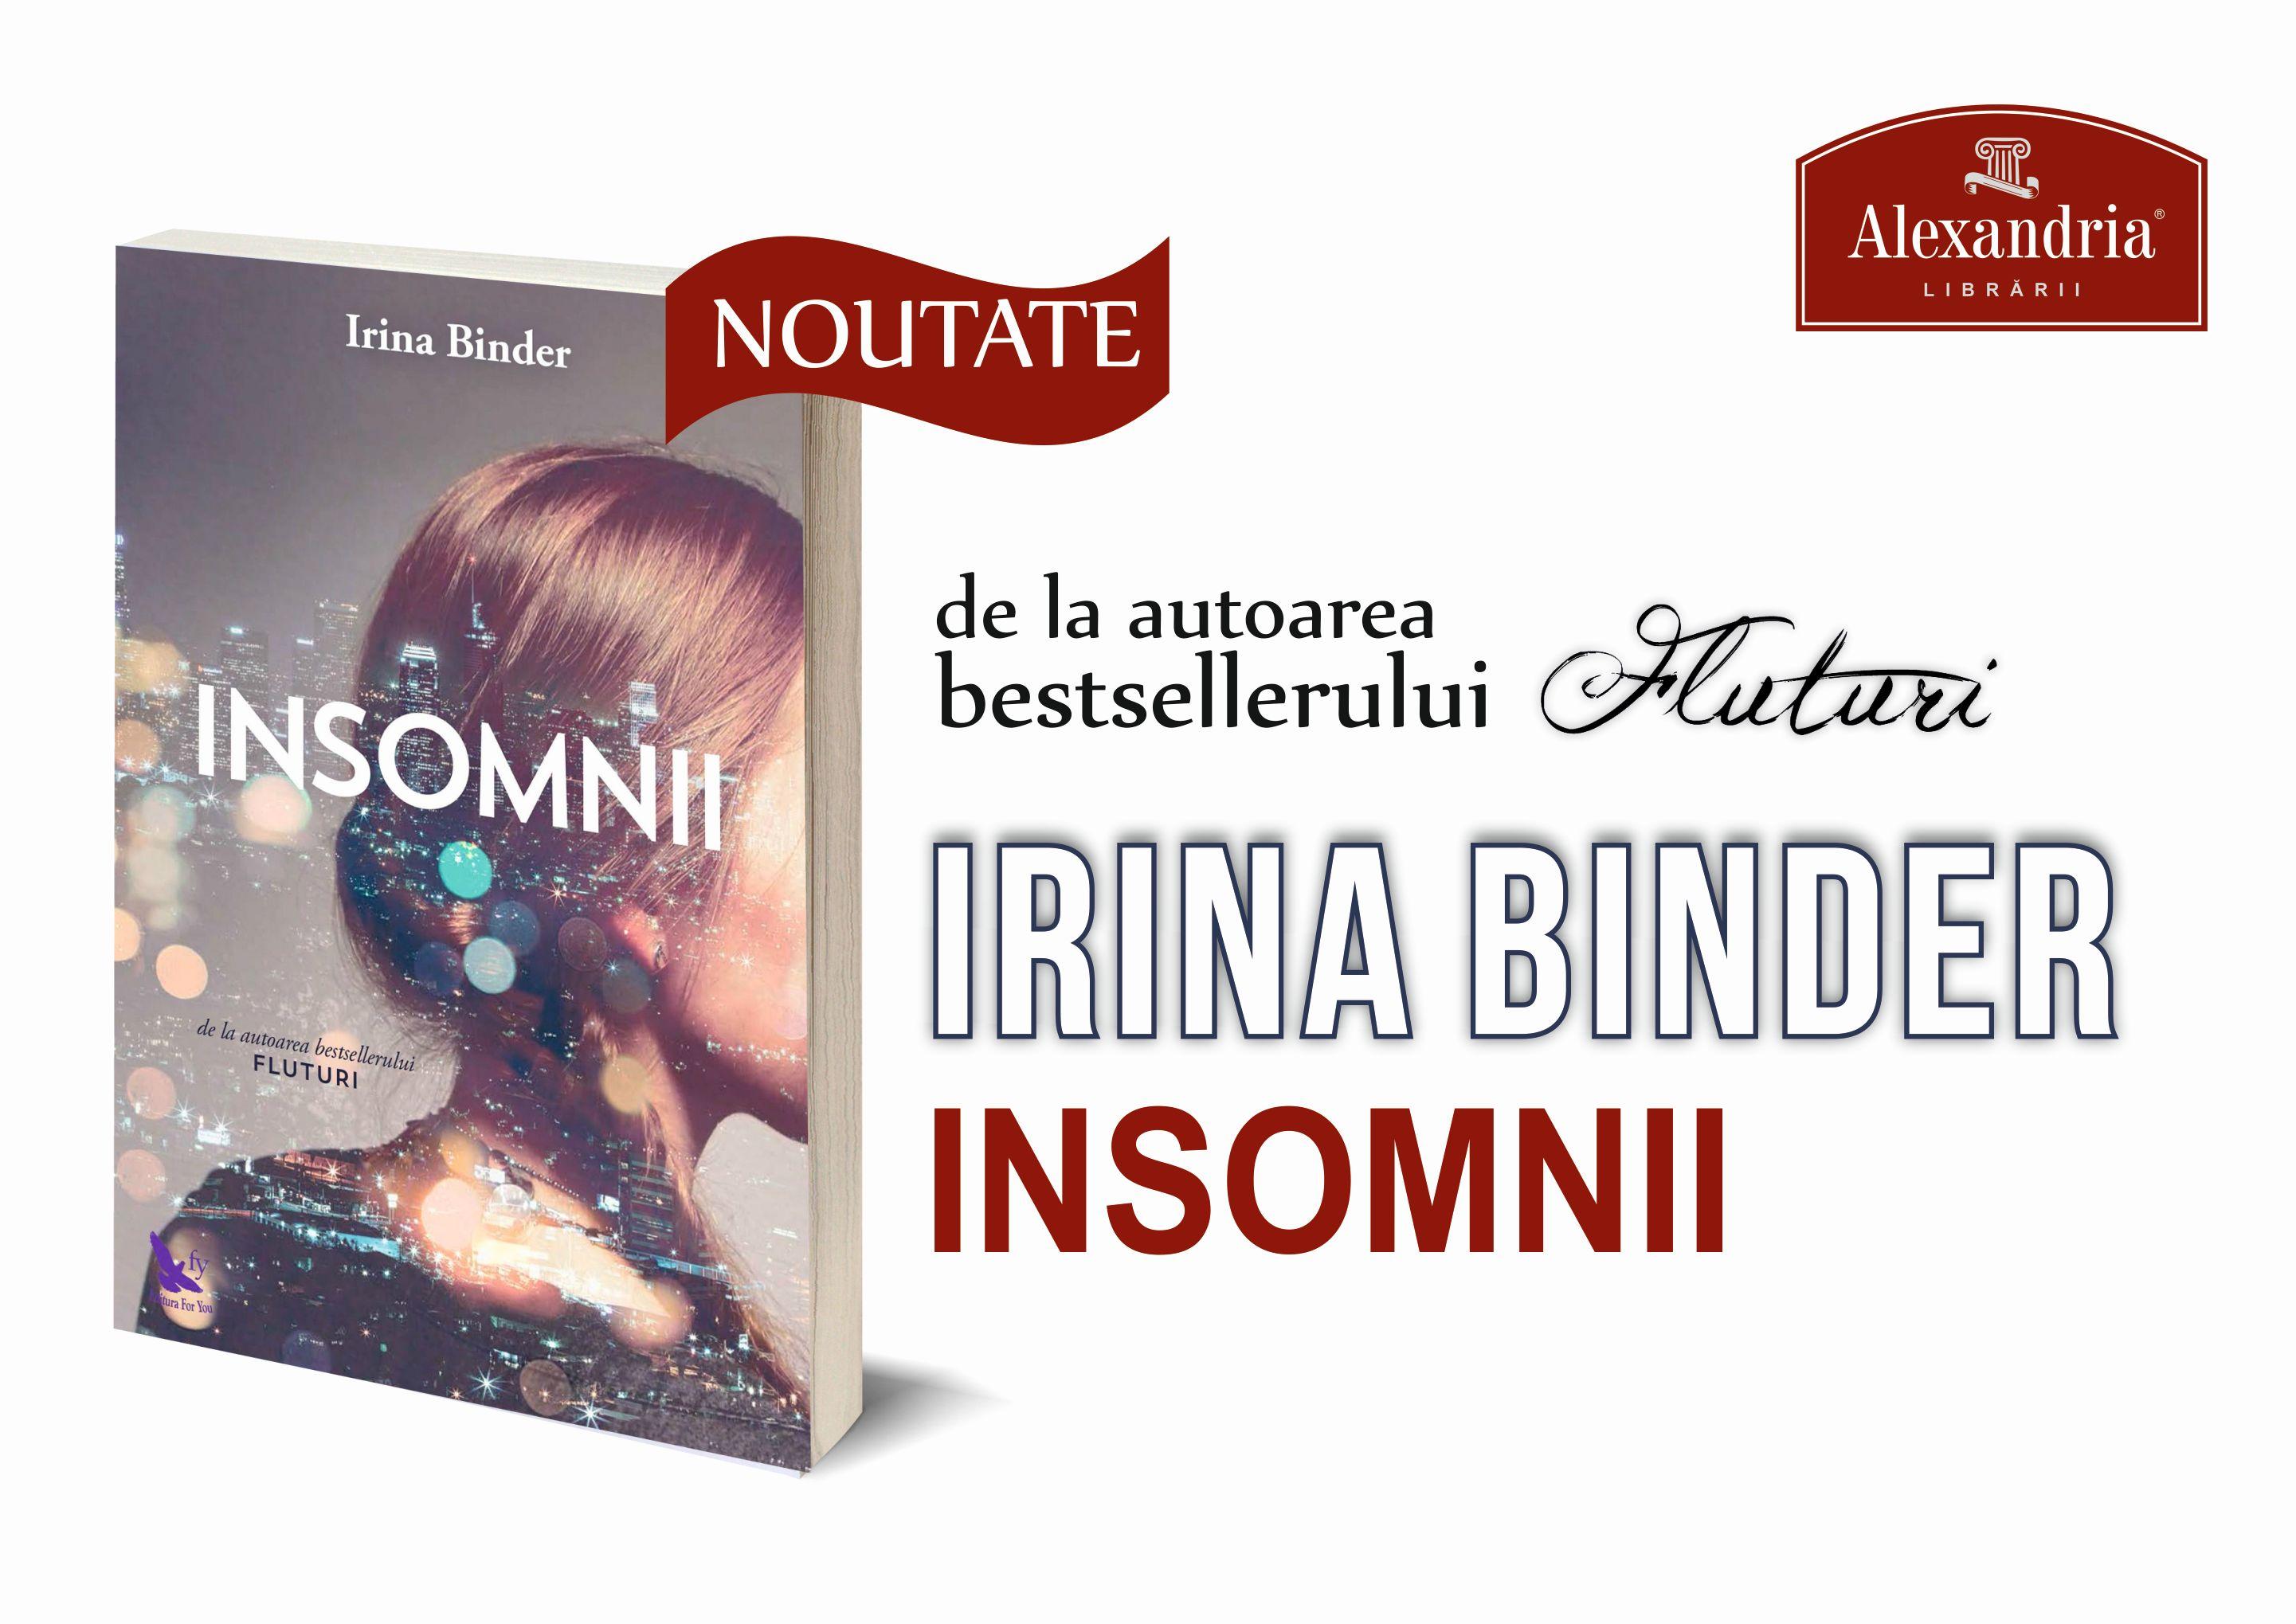 irina-binder-alexandria